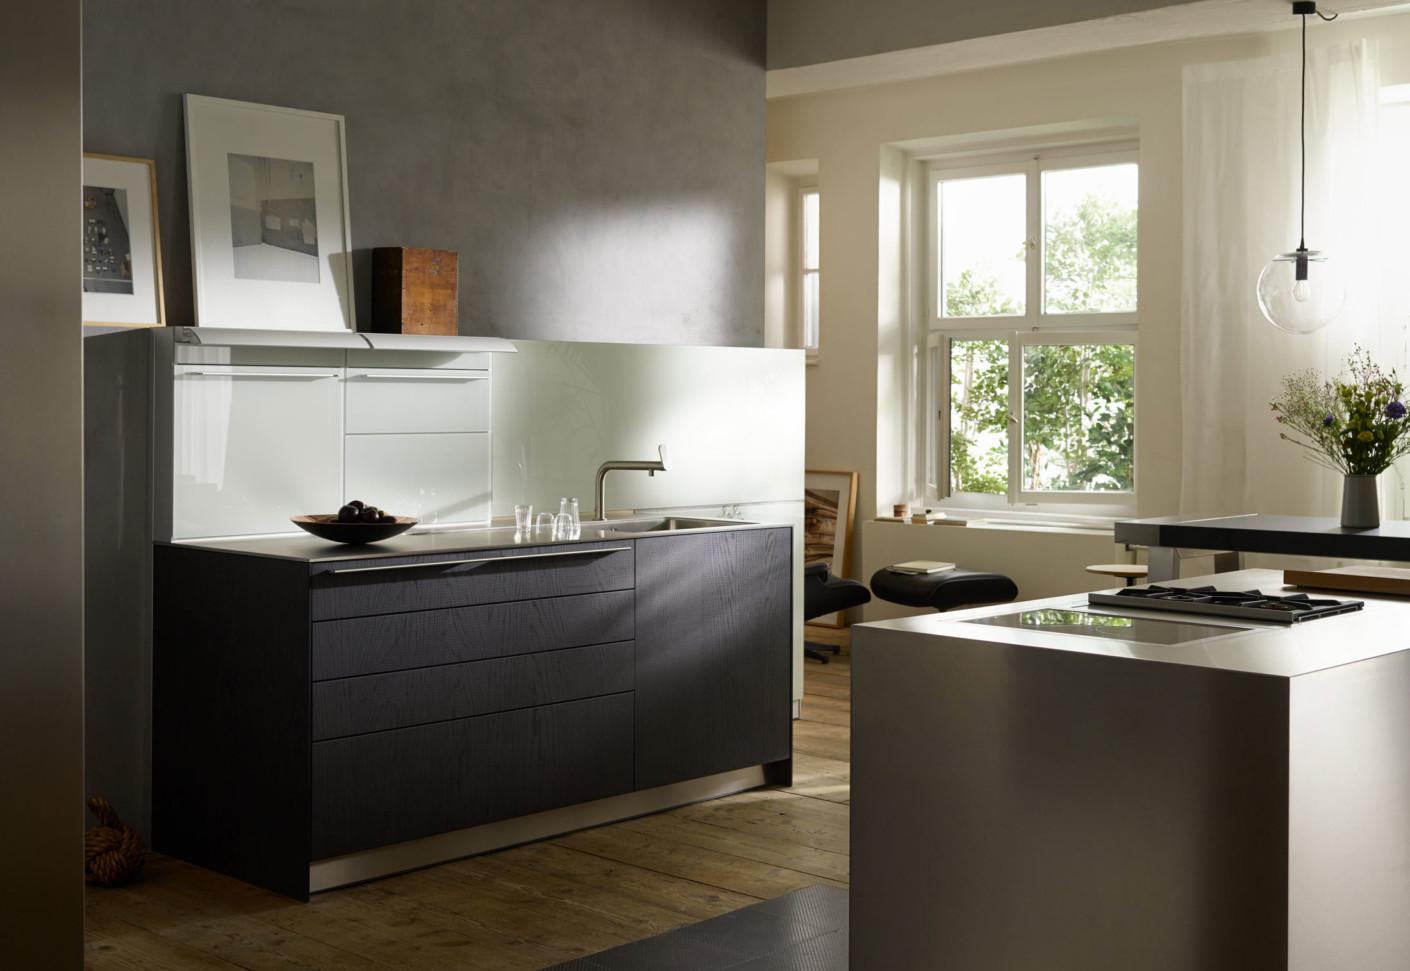 bulthaup b3 von bulthaup stylepark. Black Bedroom Furniture Sets. Home Design Ideas